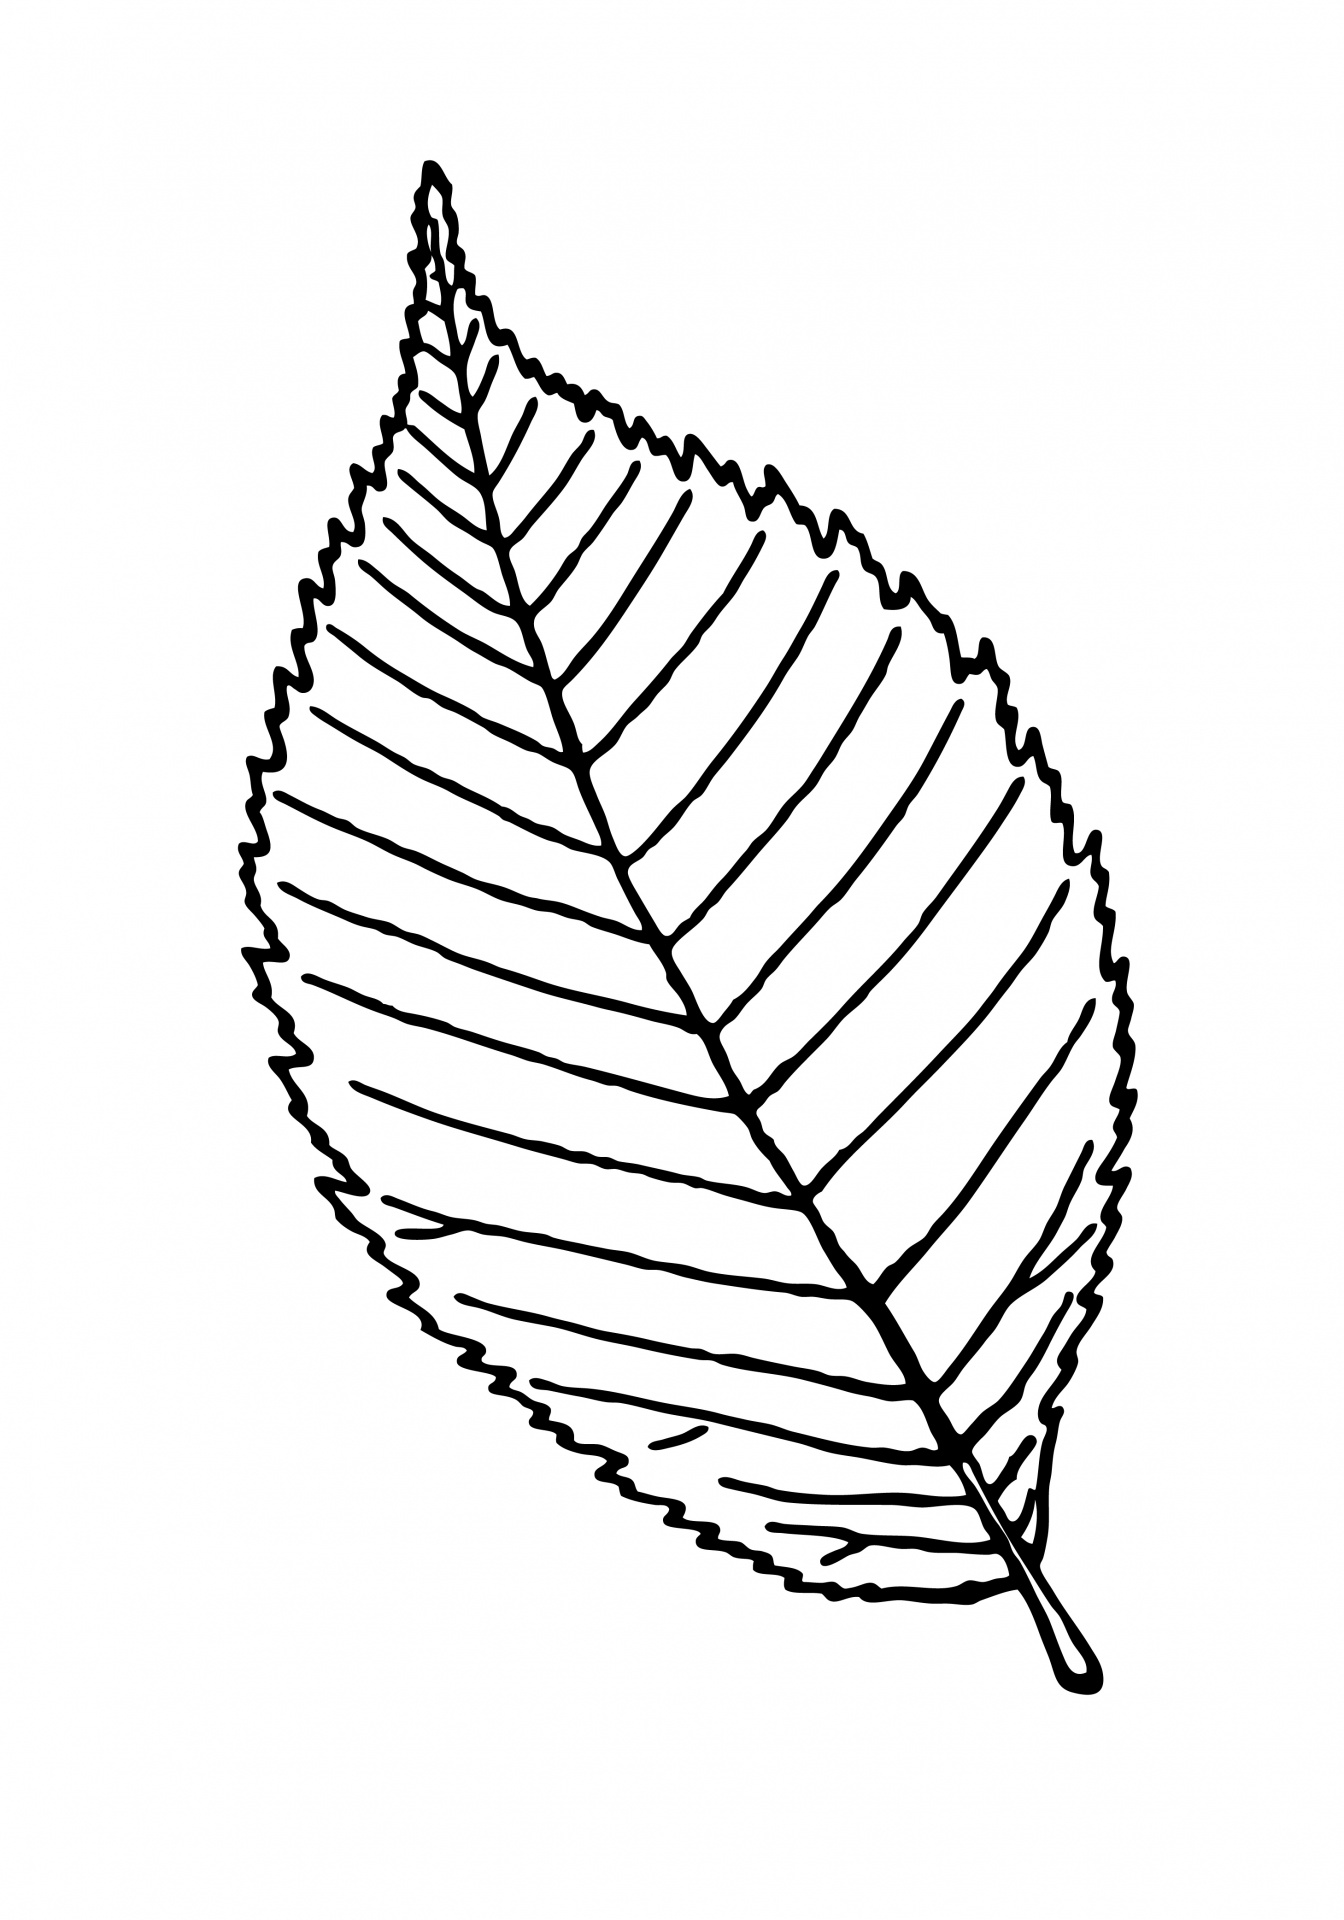 1344x1920 Leaf Outline Clipart Leaf Template